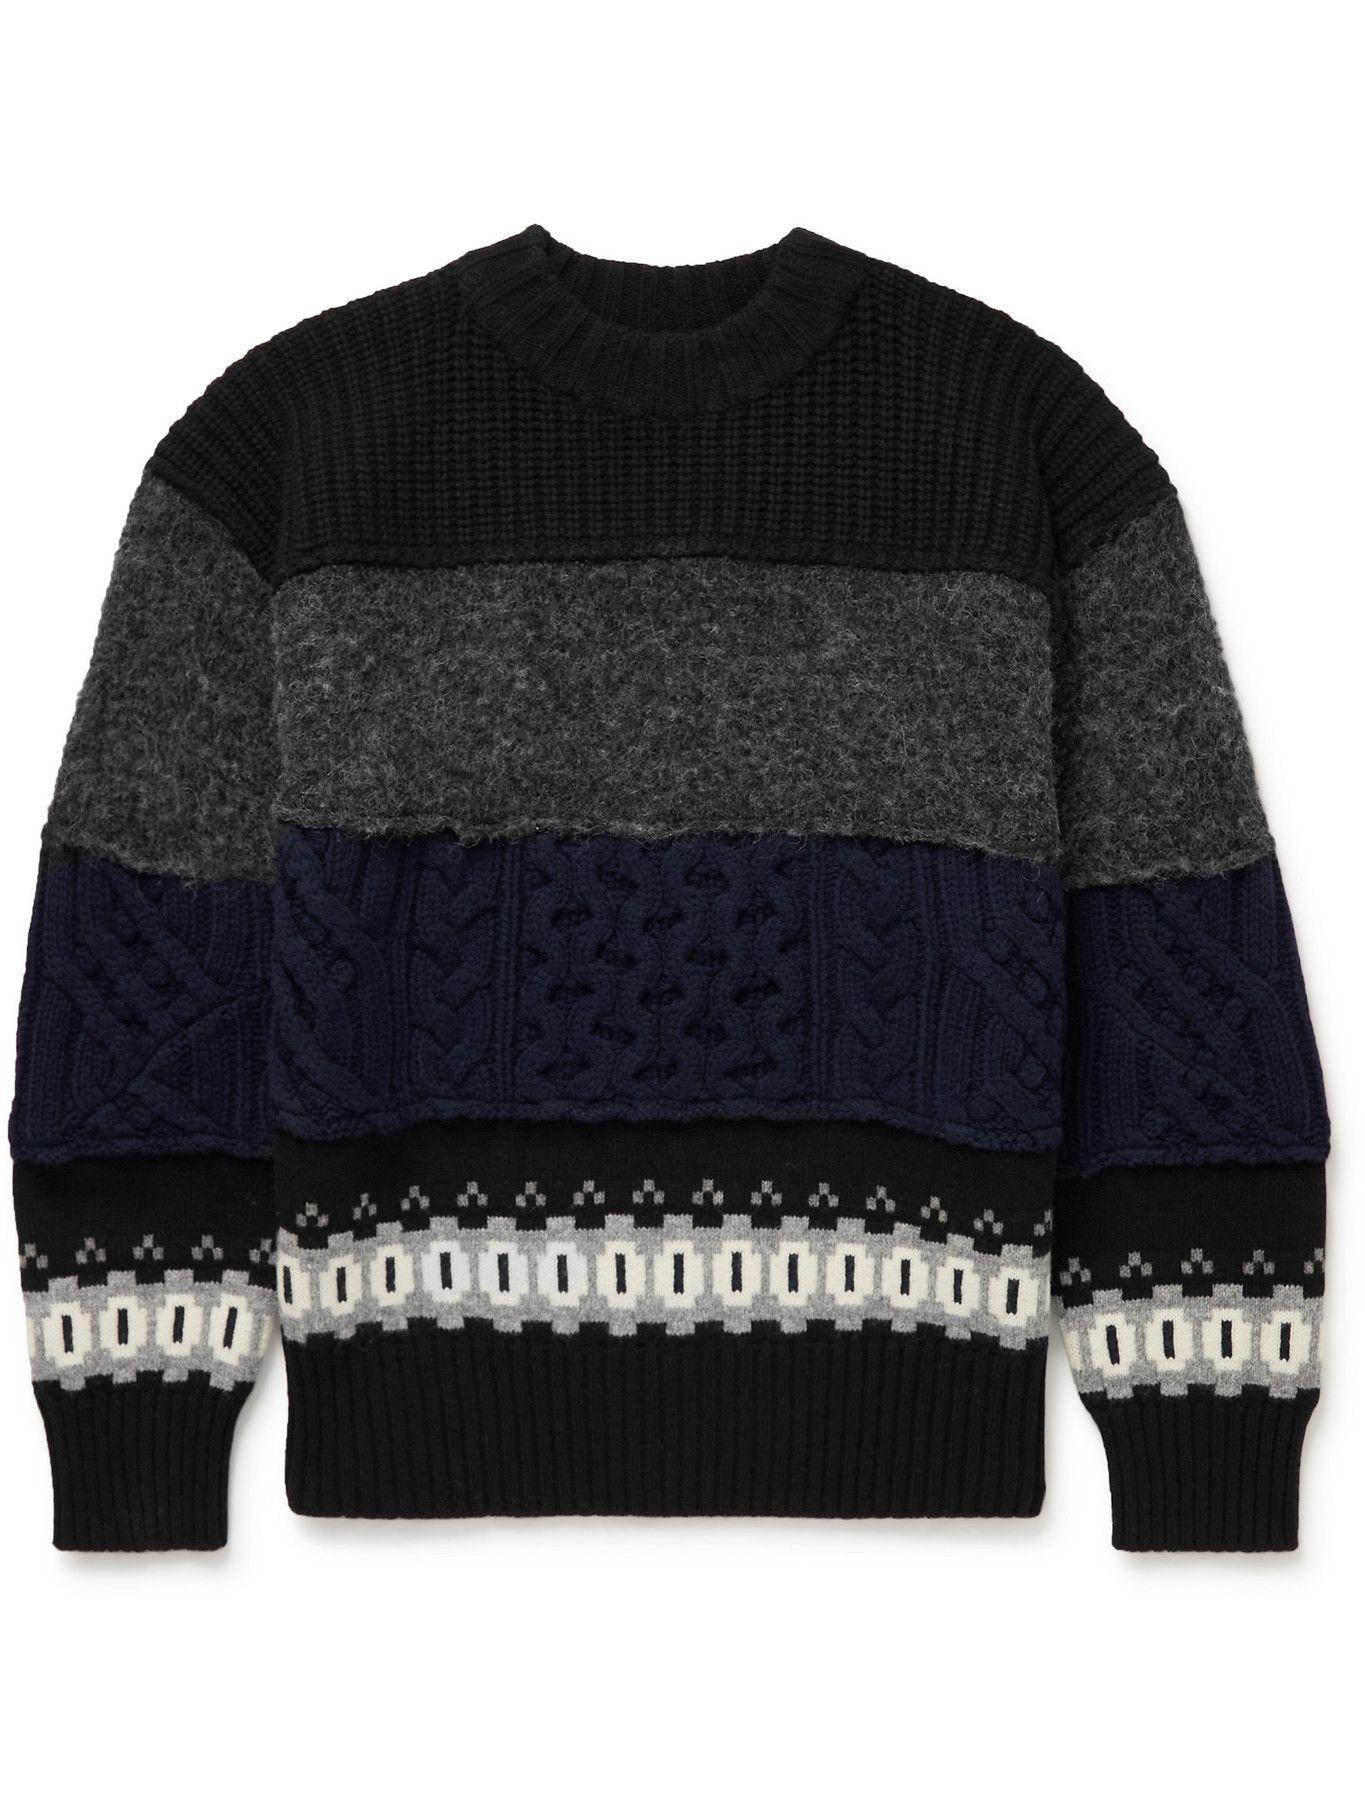 Sacai - Panelled Wool-Blend Sweater - Black